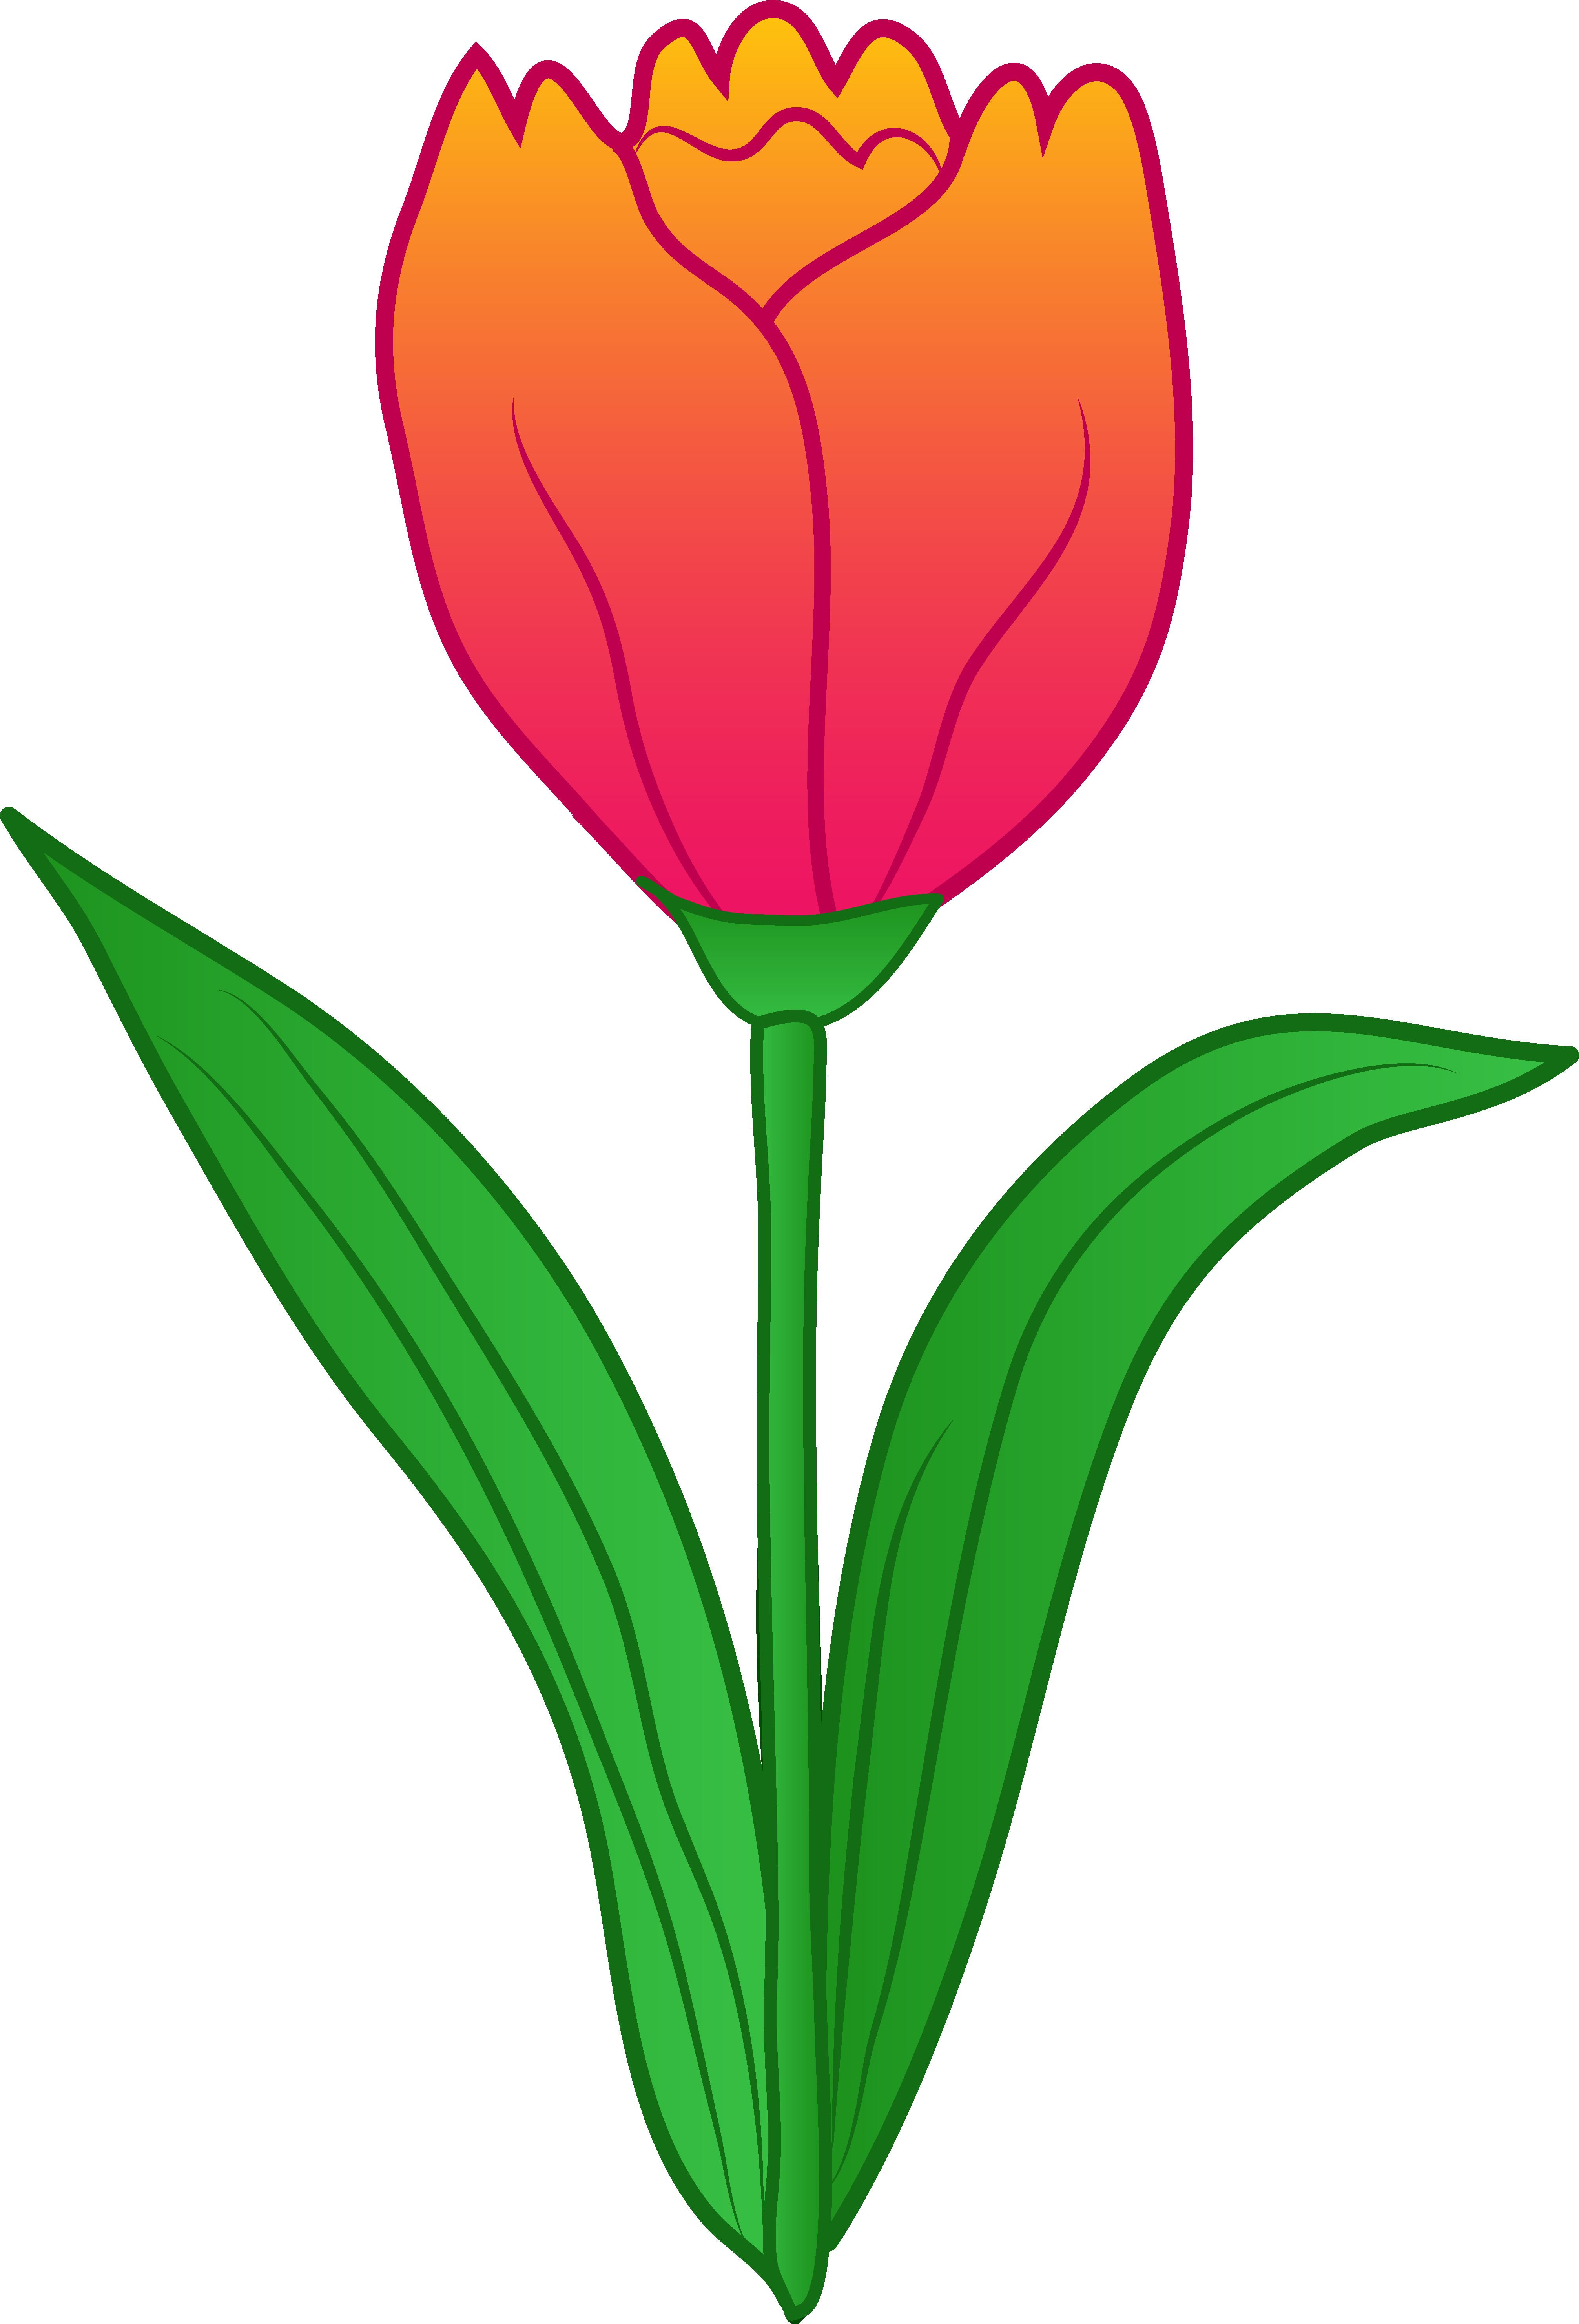 Clipart leaves tulip. Flower clip art free